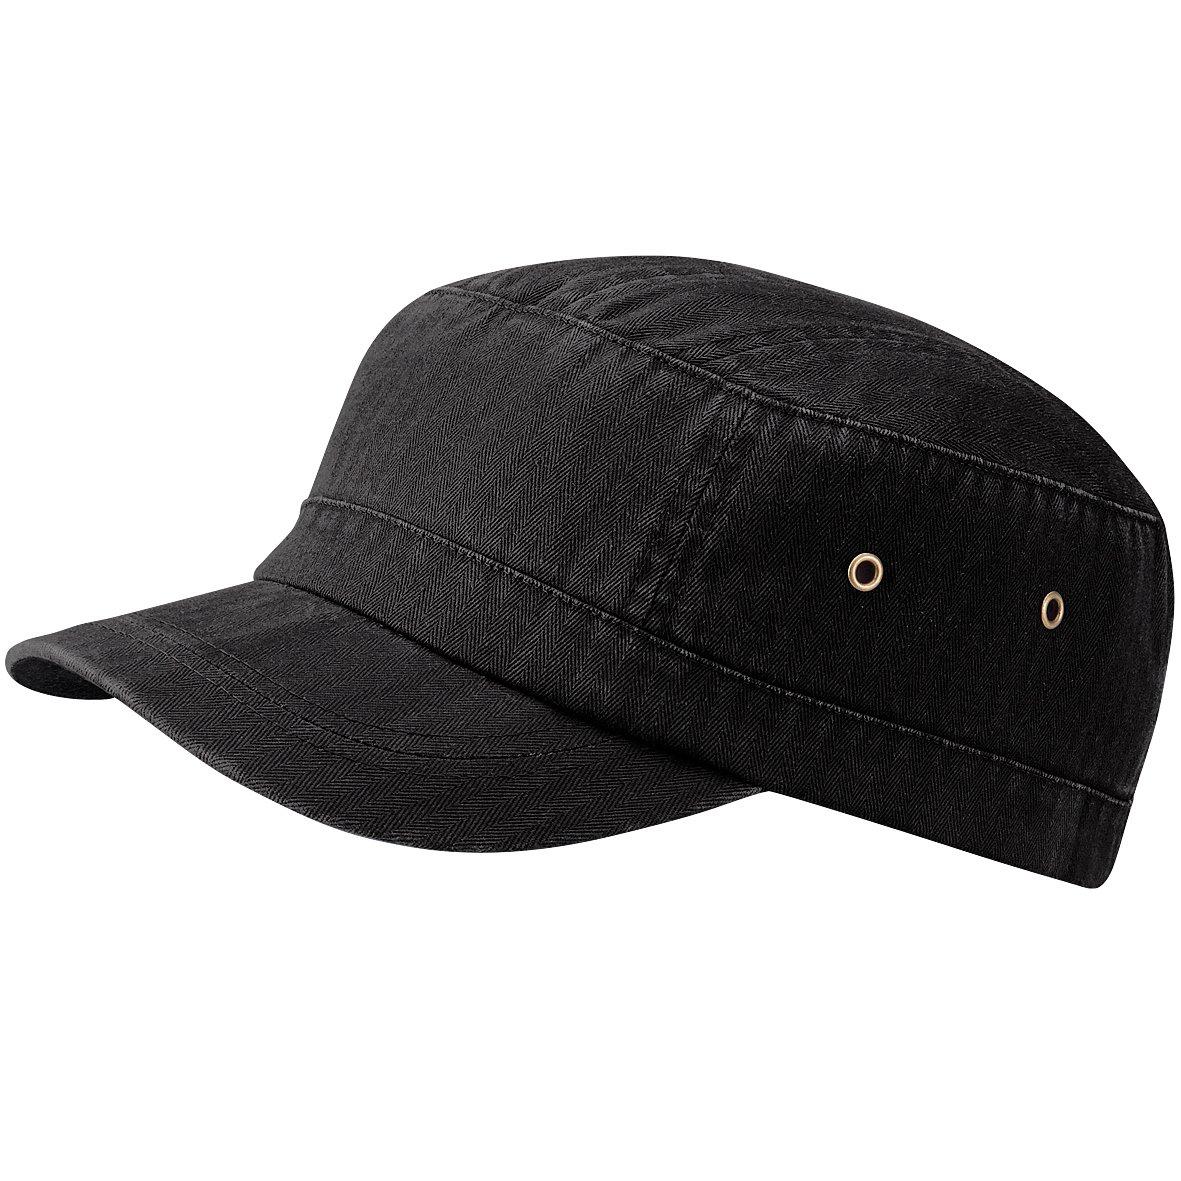 Amazon.com: Beechfield Unisex Urban Army Cap / Headwear (One Size) (Vintage Black): Clothing